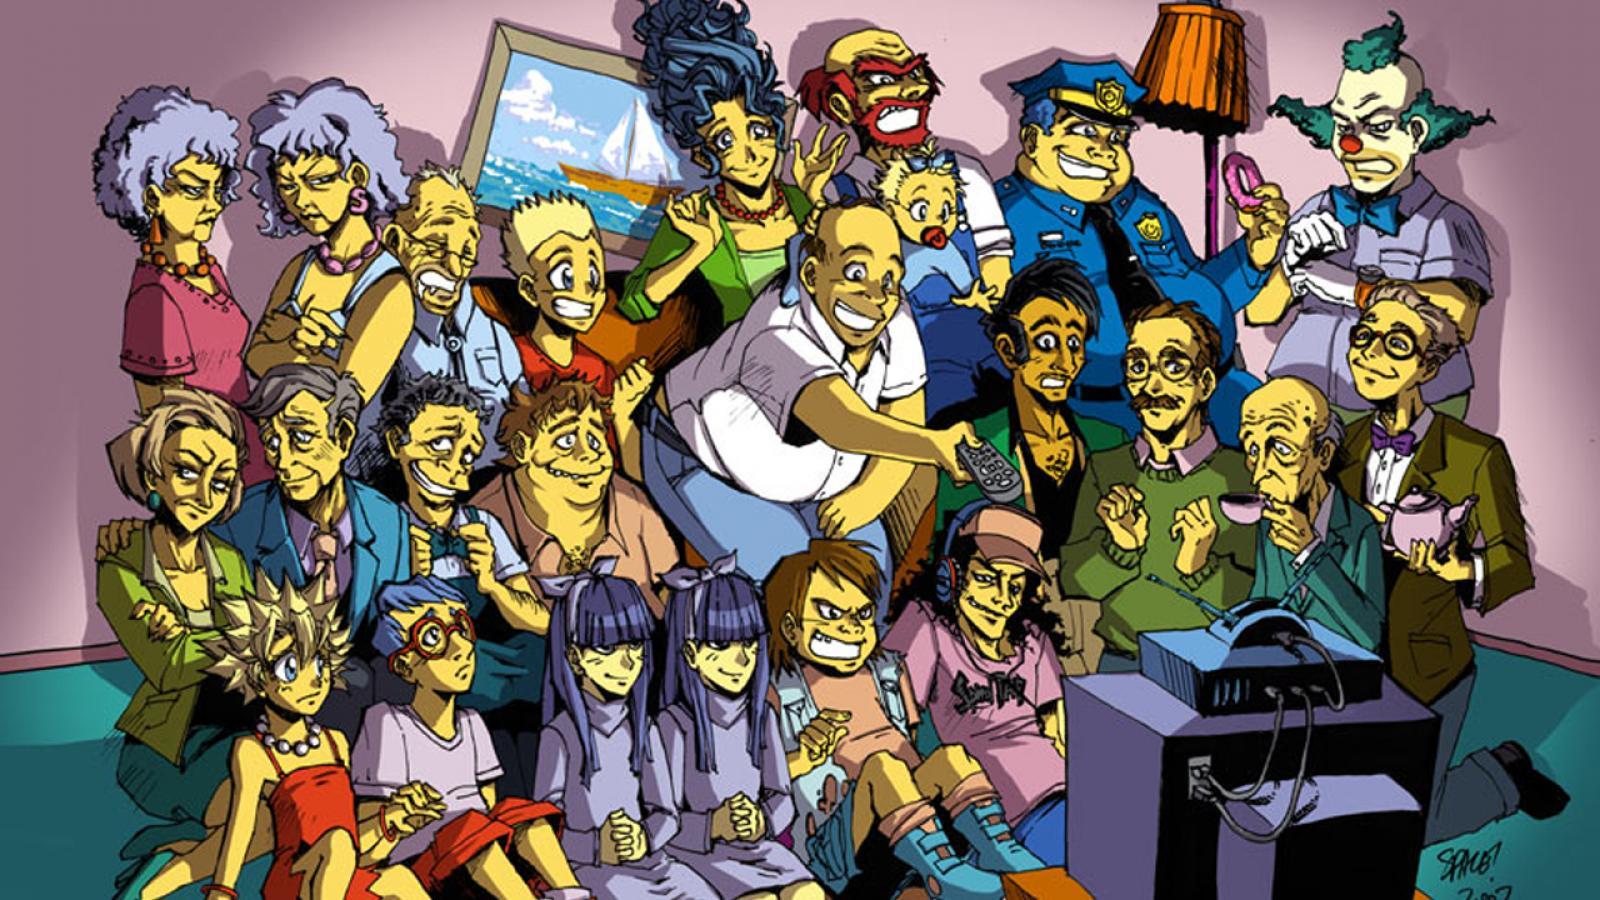 Apu Nahasapeemapetilon Bart Simpson Homer Simpson Krusty The Clown